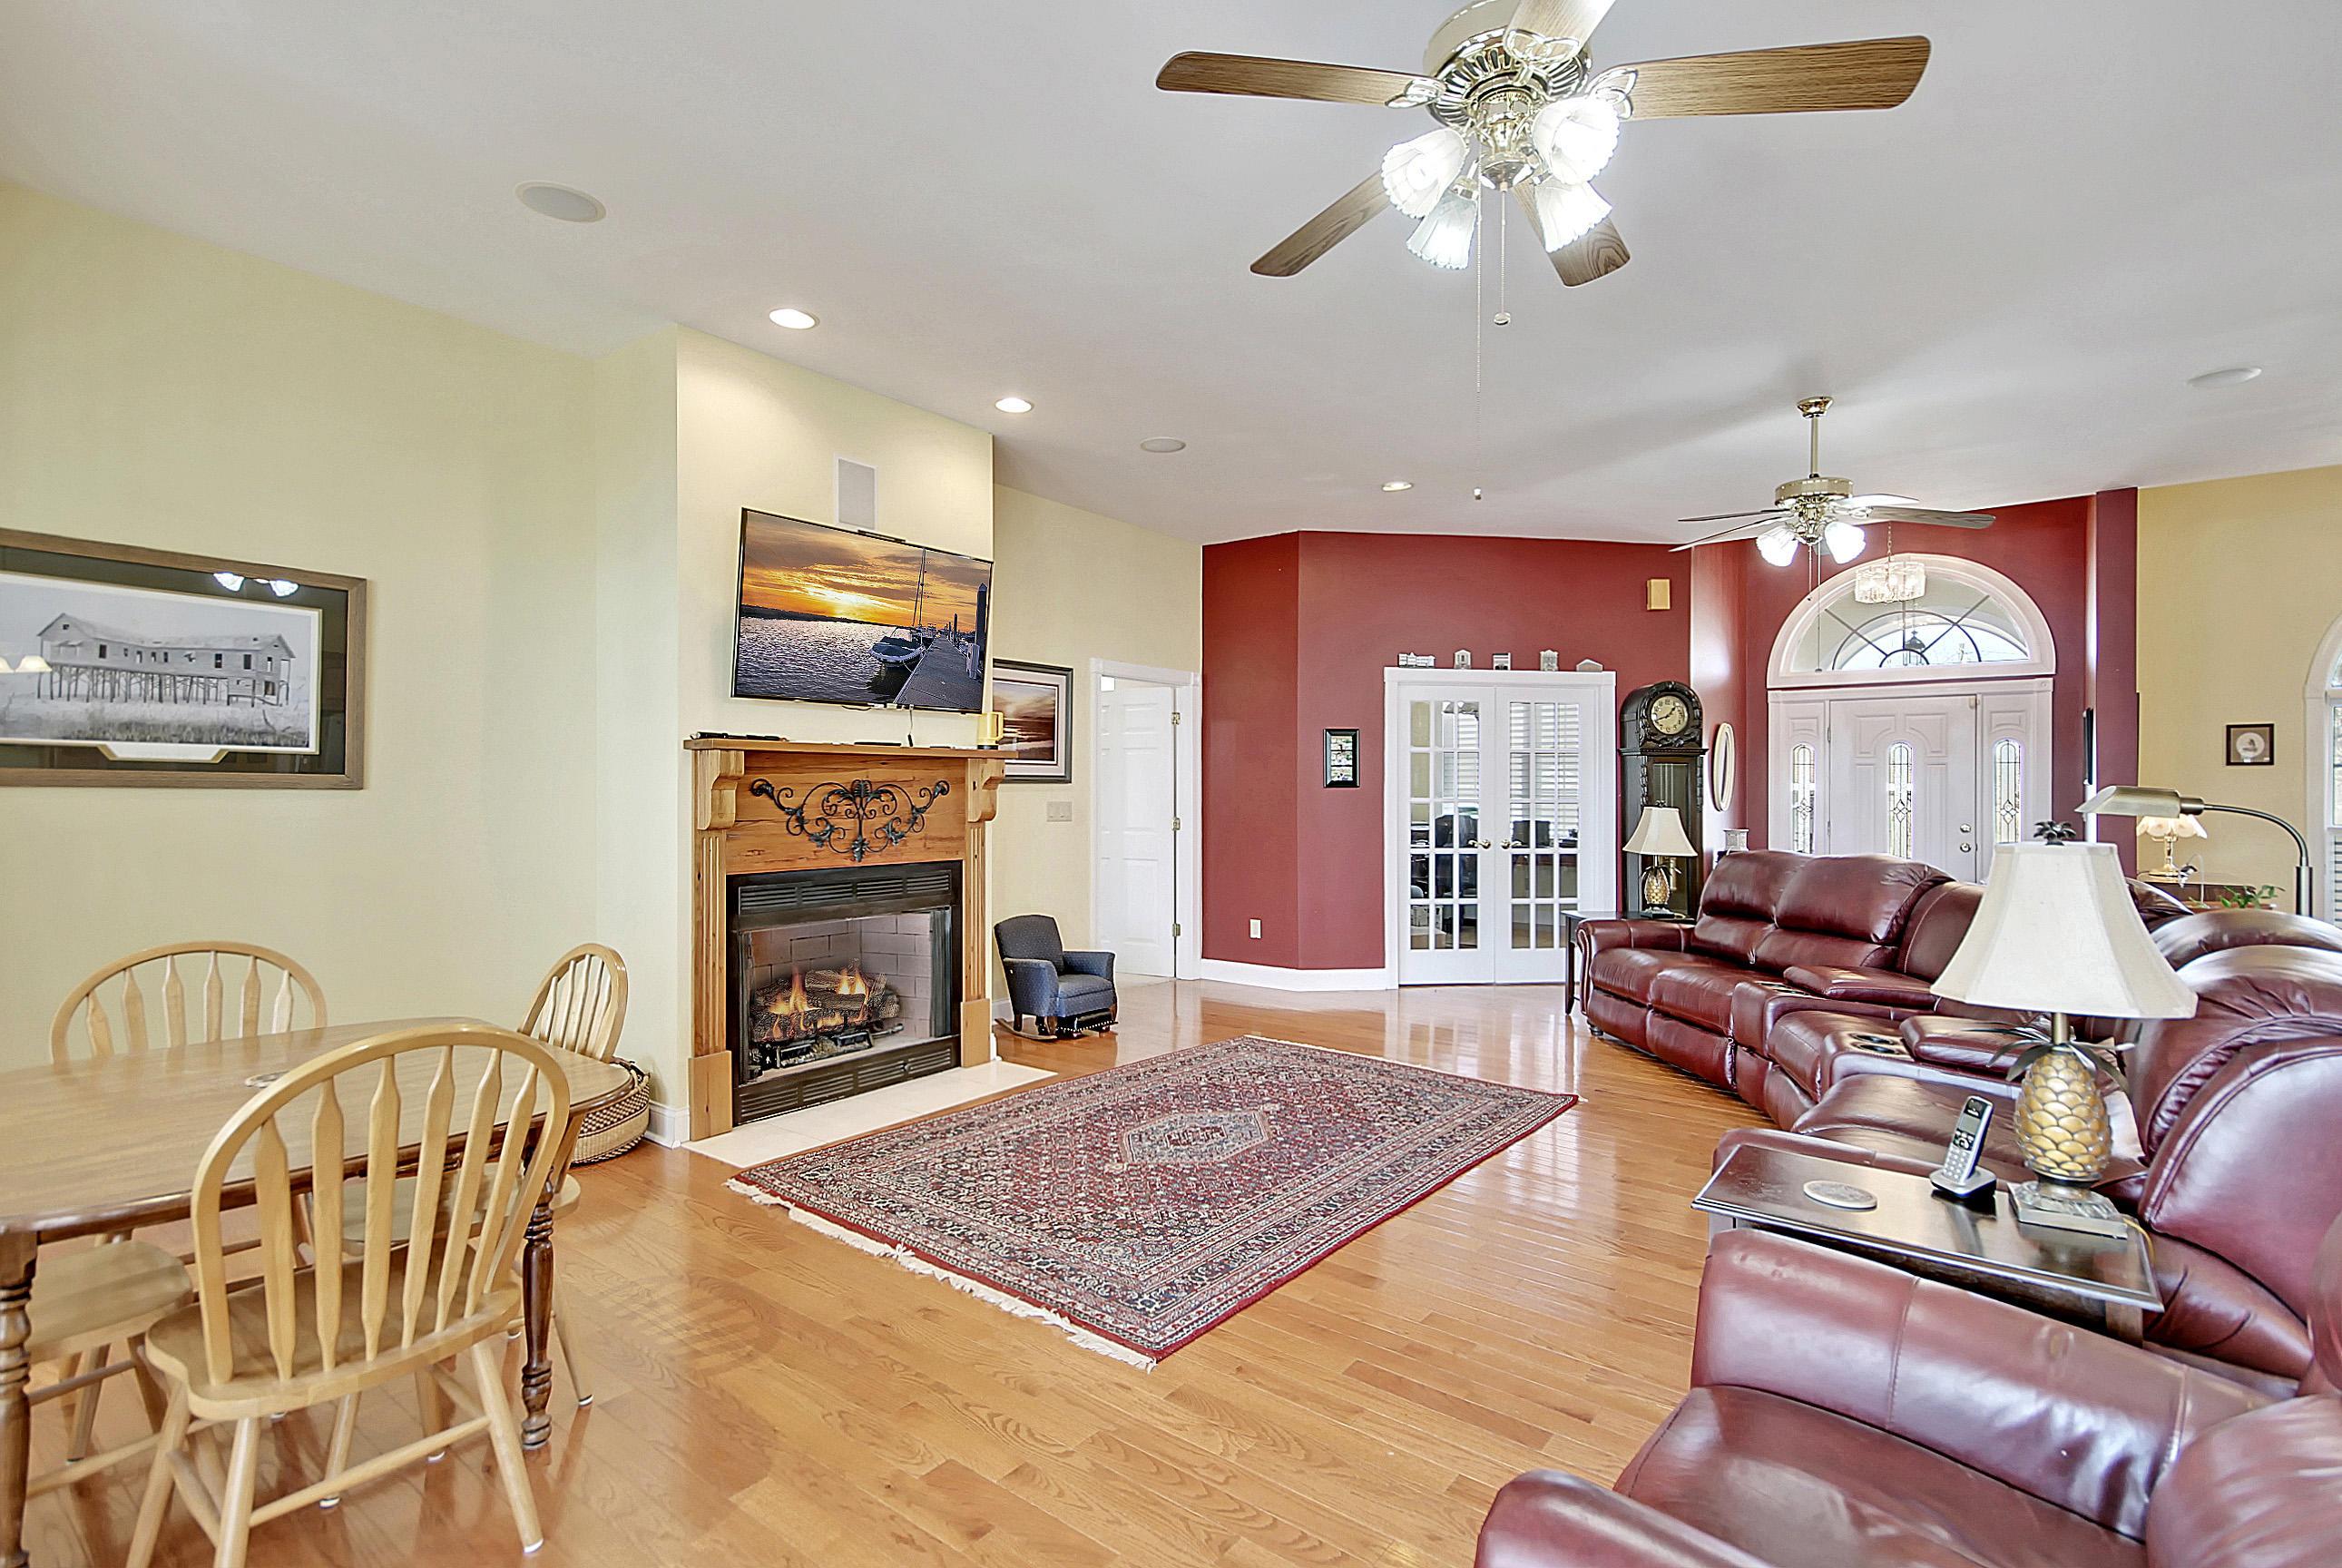 Cross Subd (Longpoint) Homes For Sale - 1191 Longpoint, Cross, SC - 16